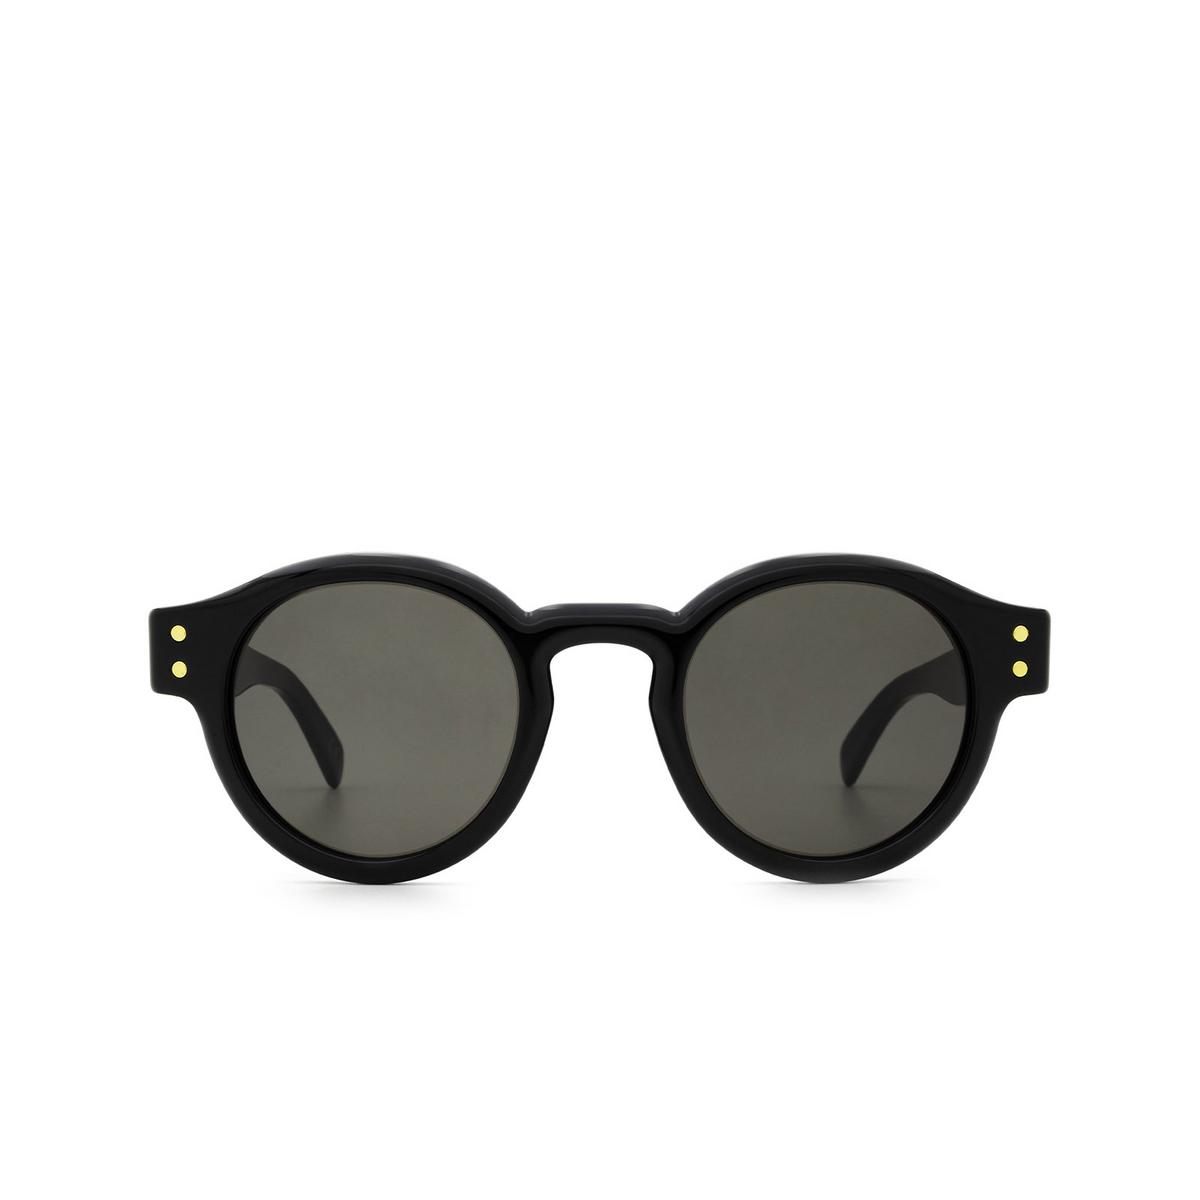 Retrosuperfuture® Round Sunglasses: Eddie color Black CC7 - front view.